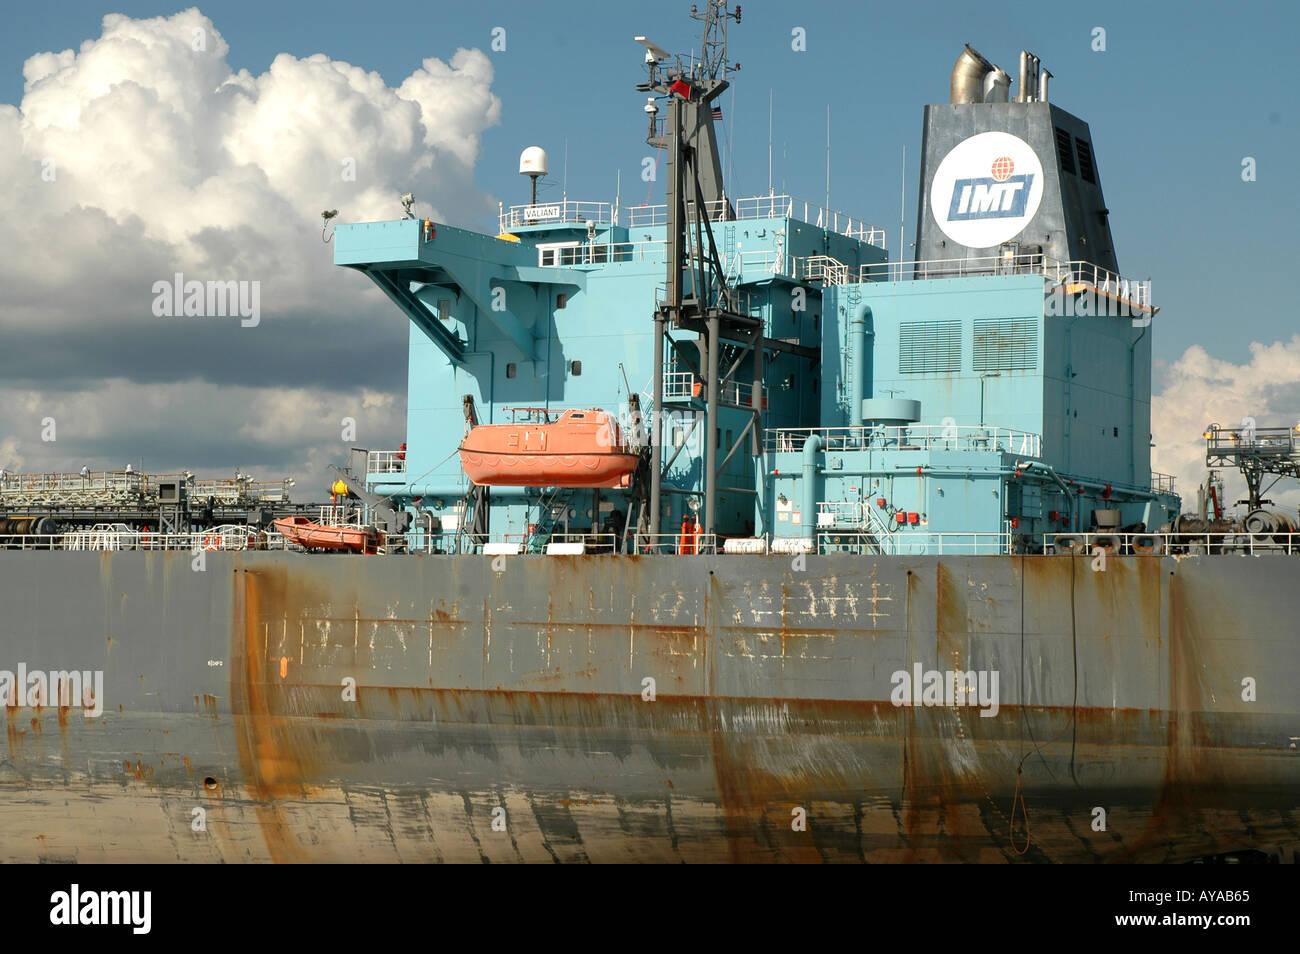 Shipping large Oil Tanker at dock Louisiana - Stock Image